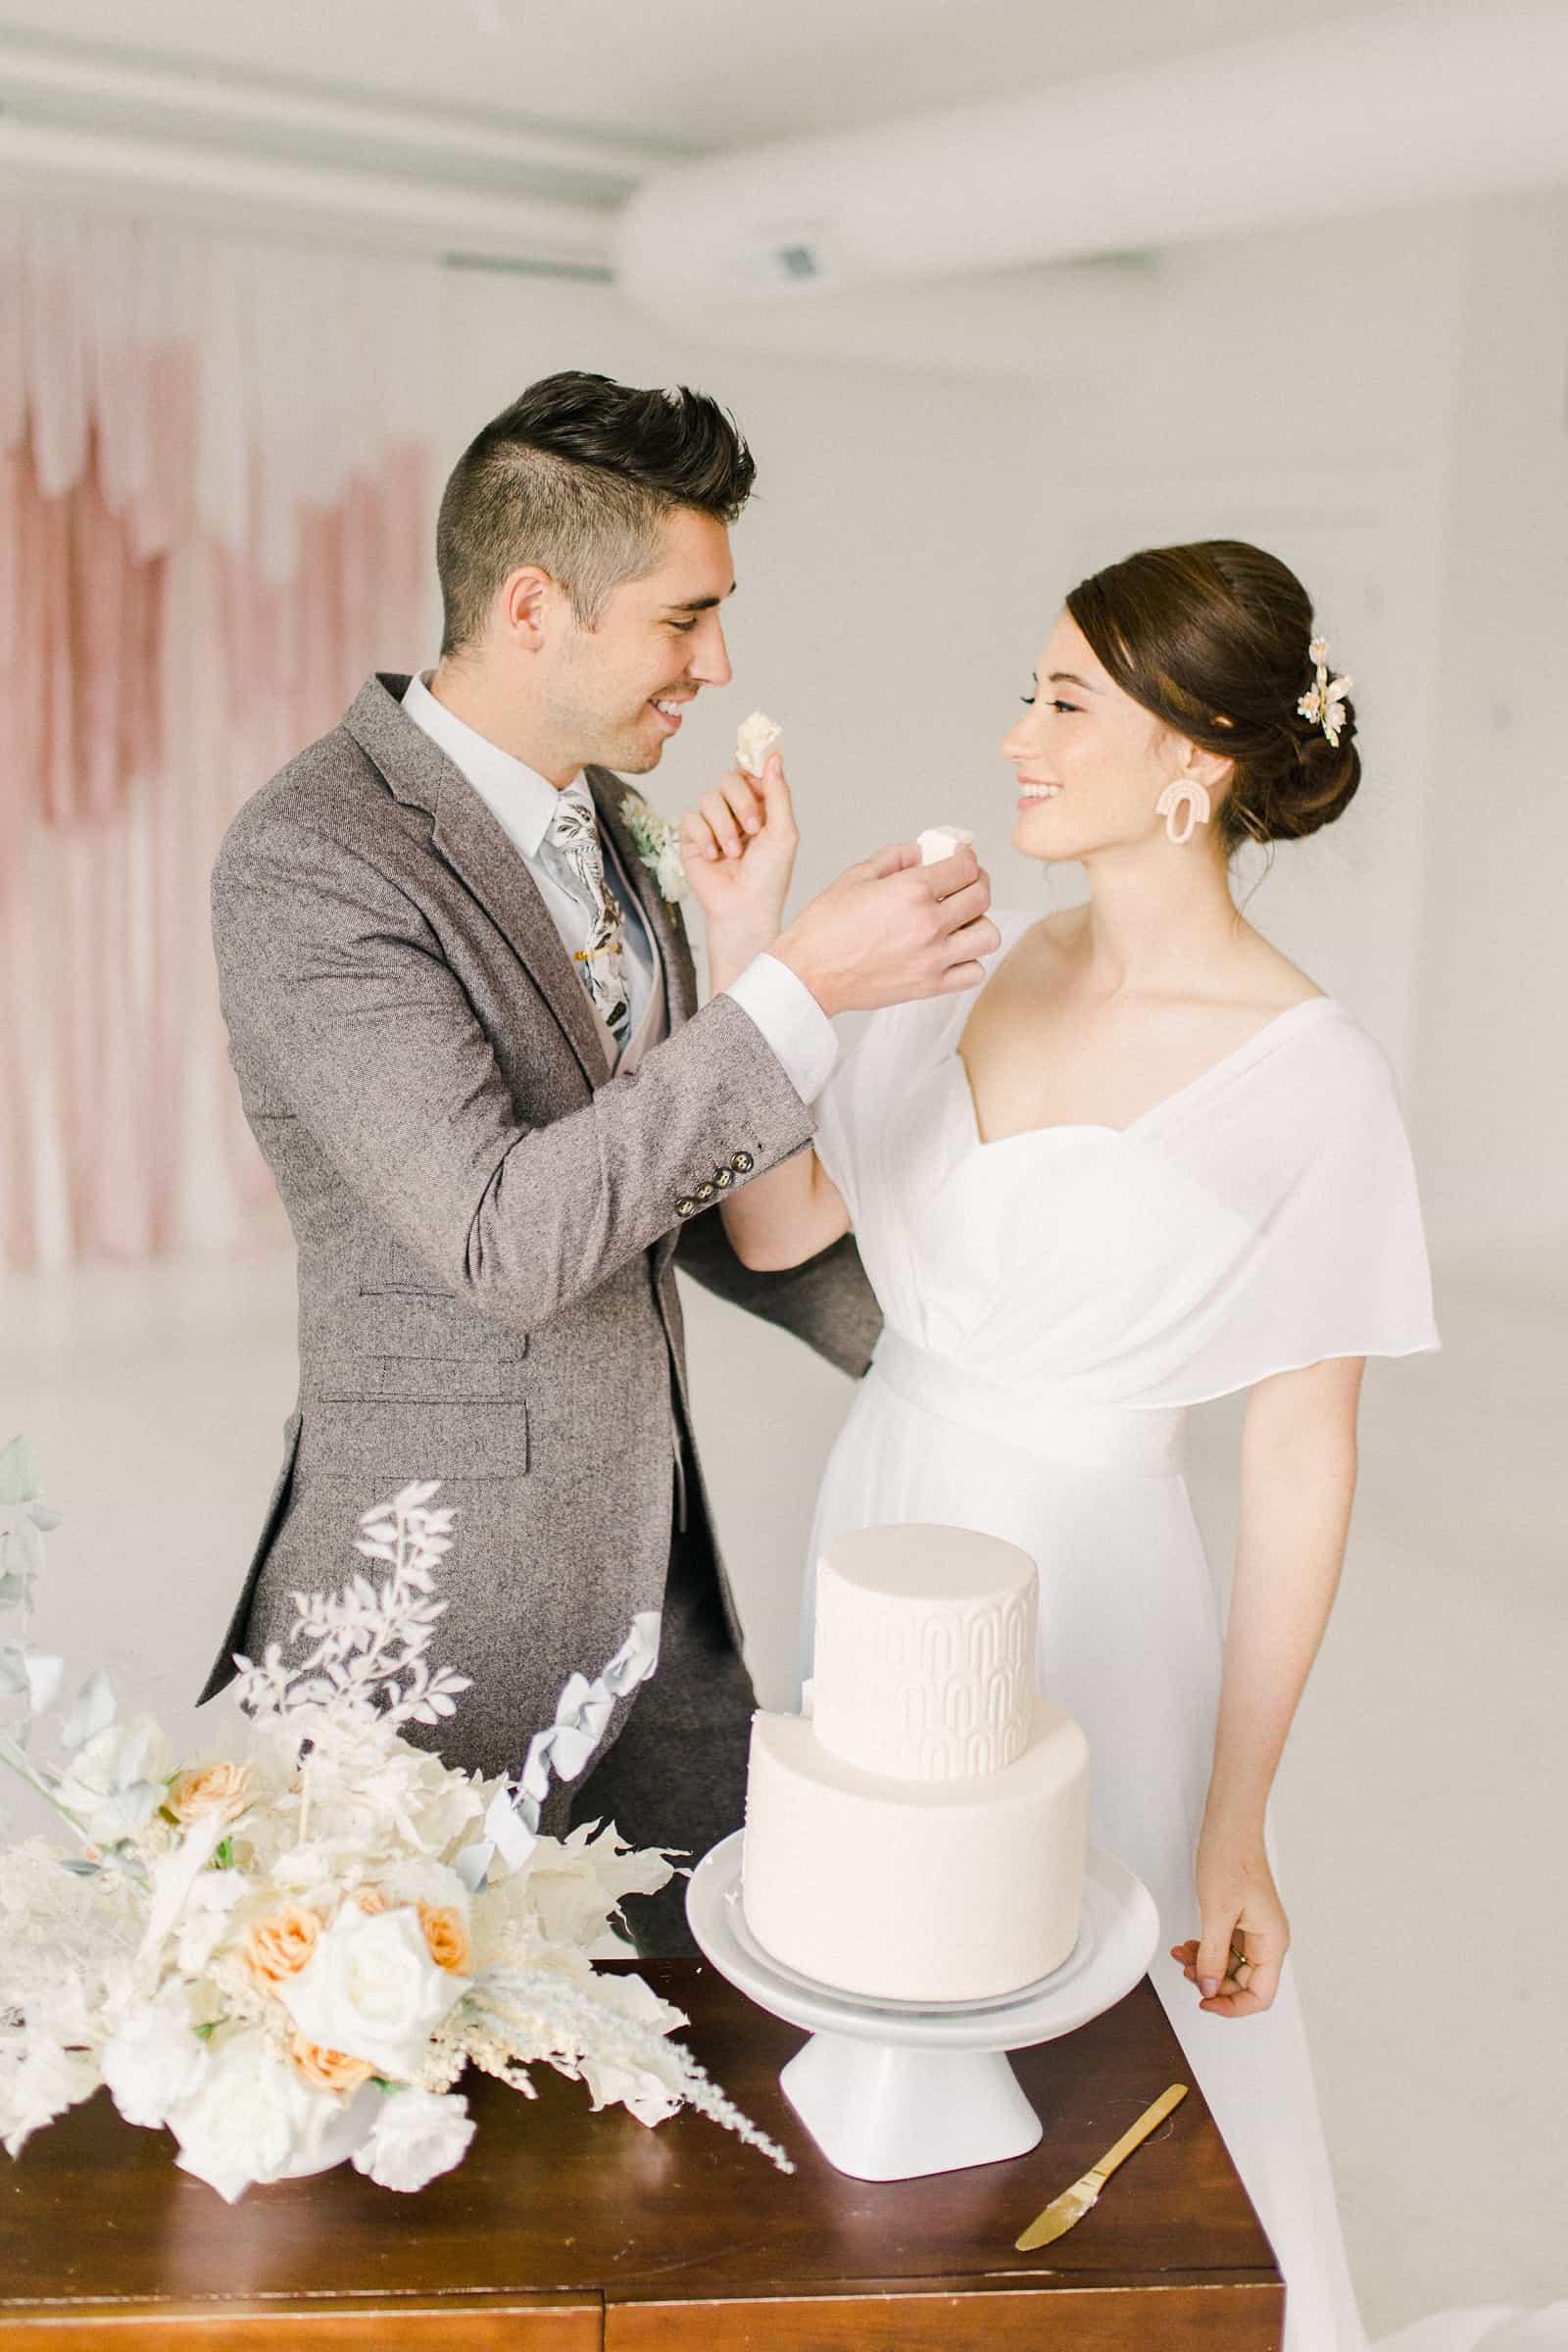 Bride and groom feed each other wedding cake, modern wedding